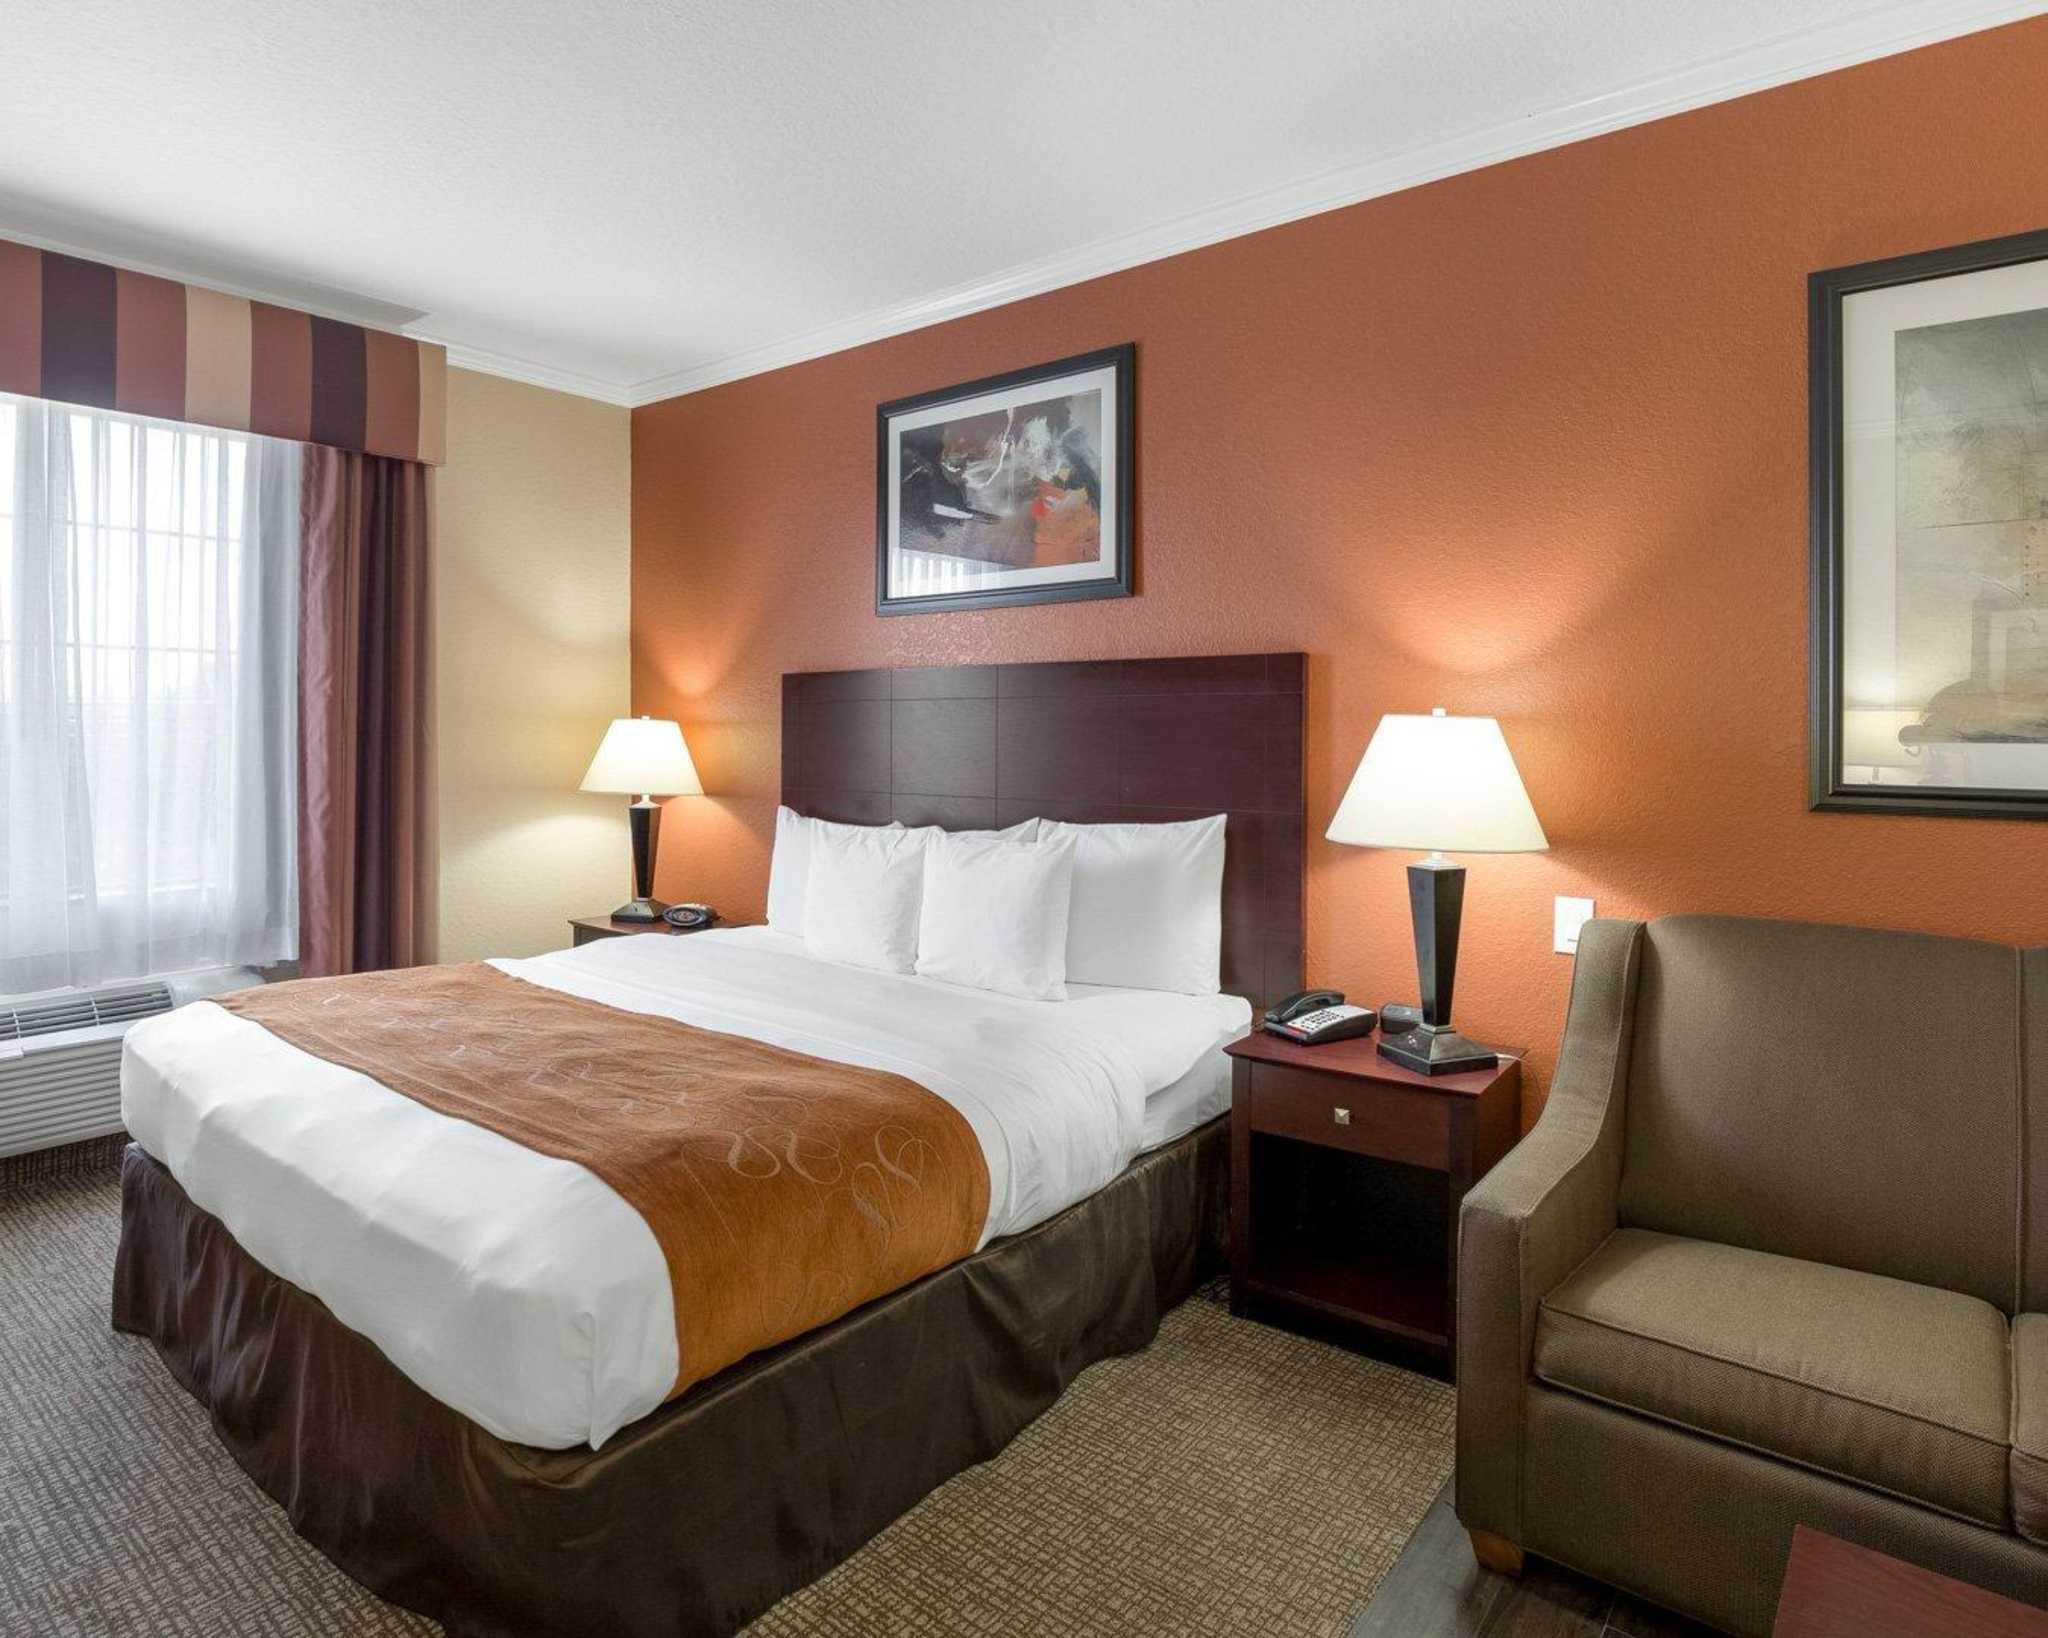 Comfort Suites image 50